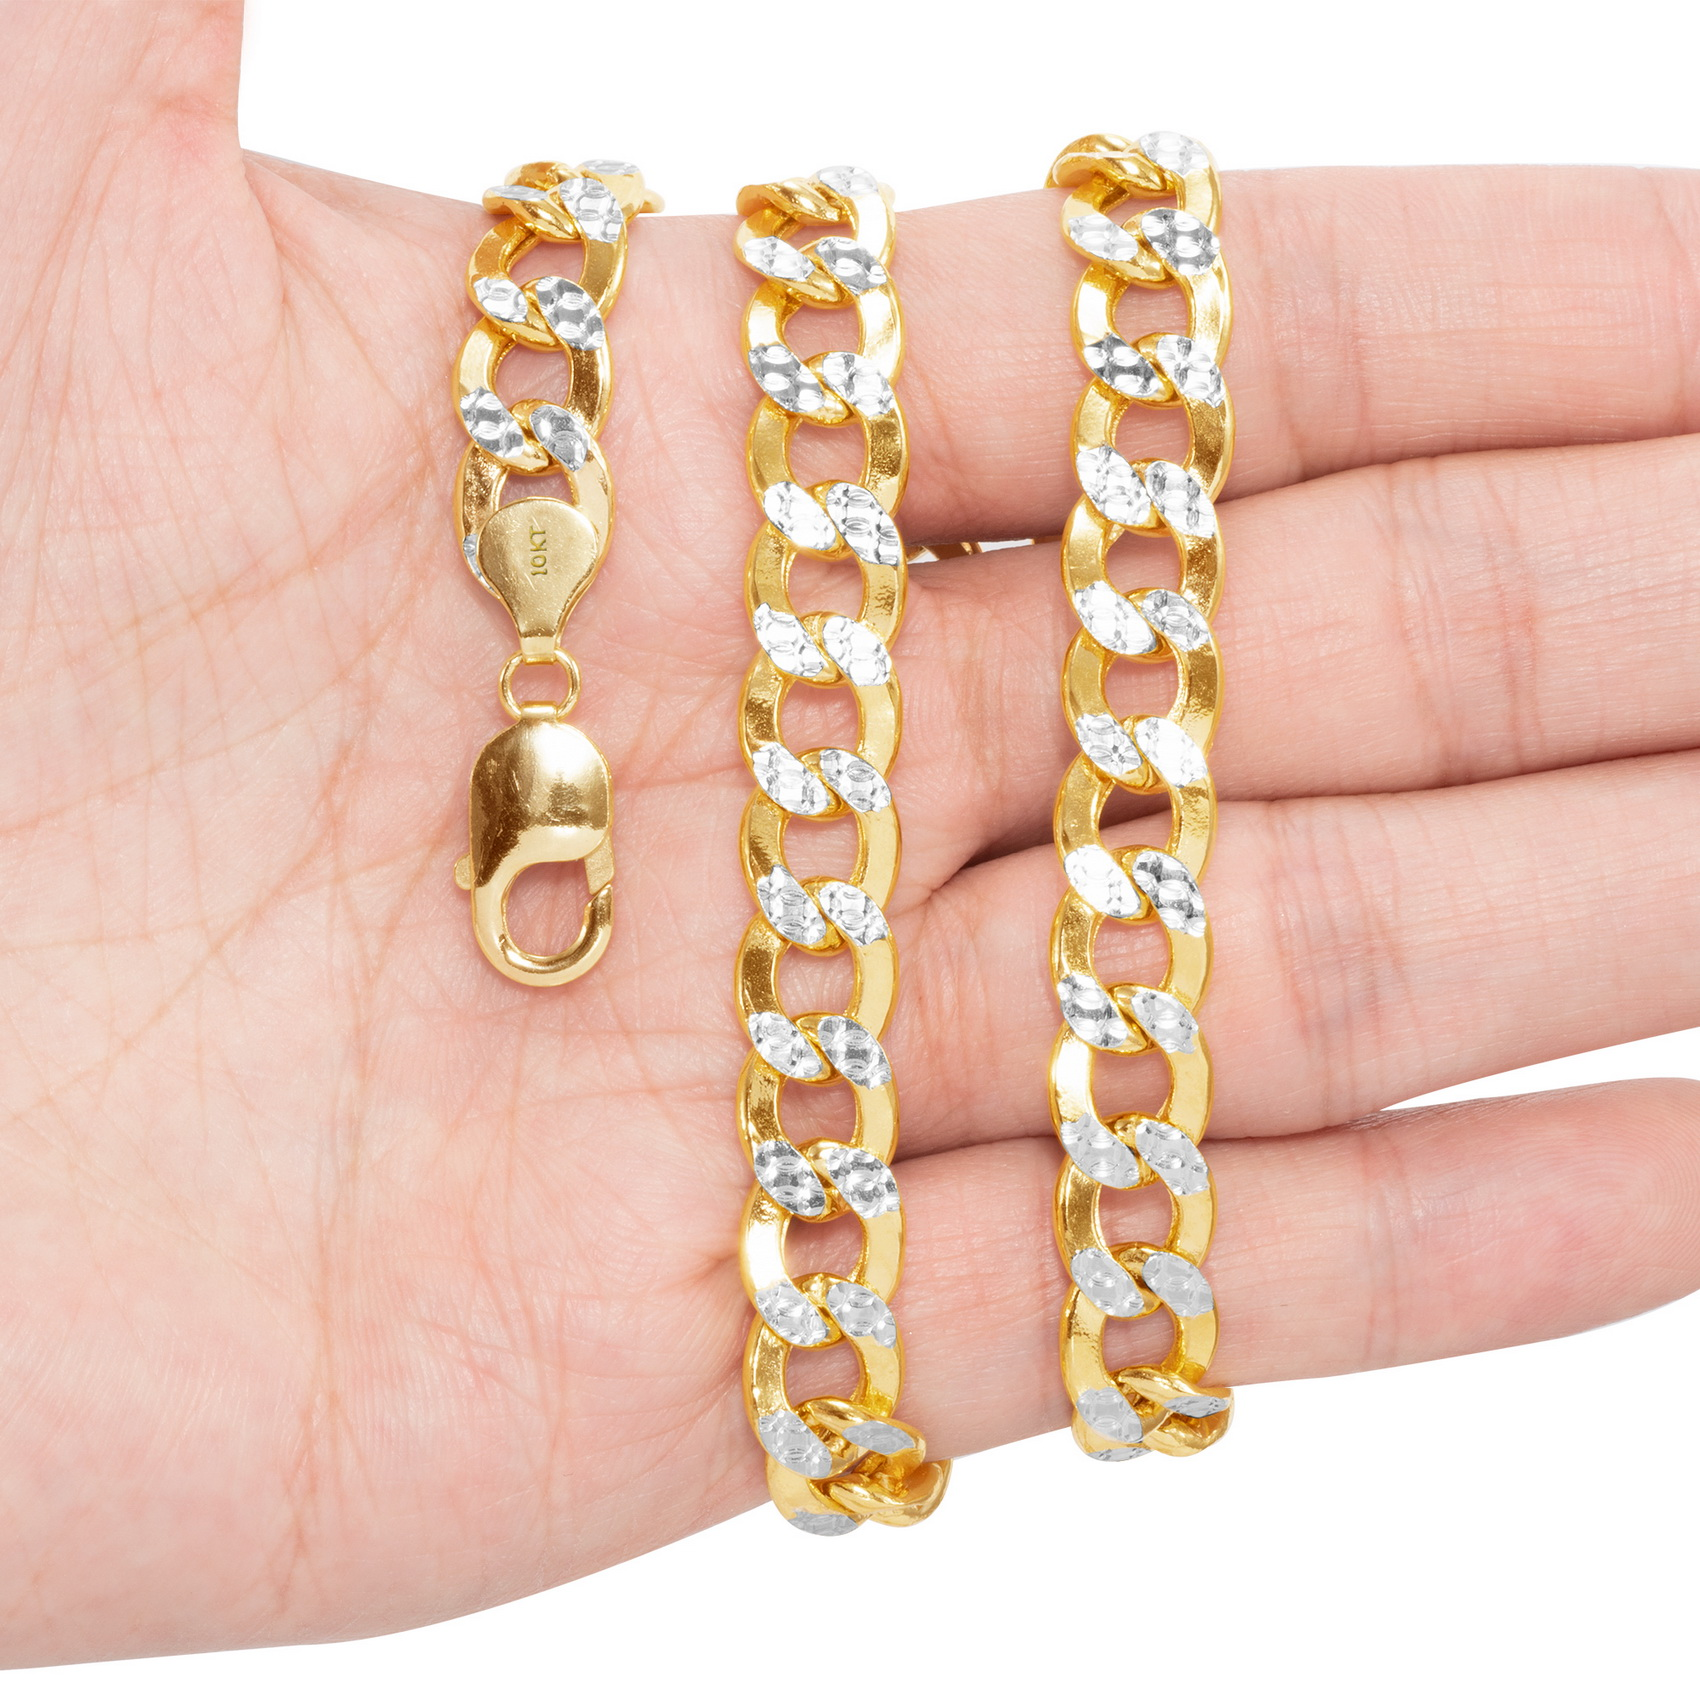 10K-Yellow-Gold-2mm-10-5mm-Diamond-Cut-Pave-Cuban-Chain-Necklace-Bracelet-7-034-30-034 thumbnail 29